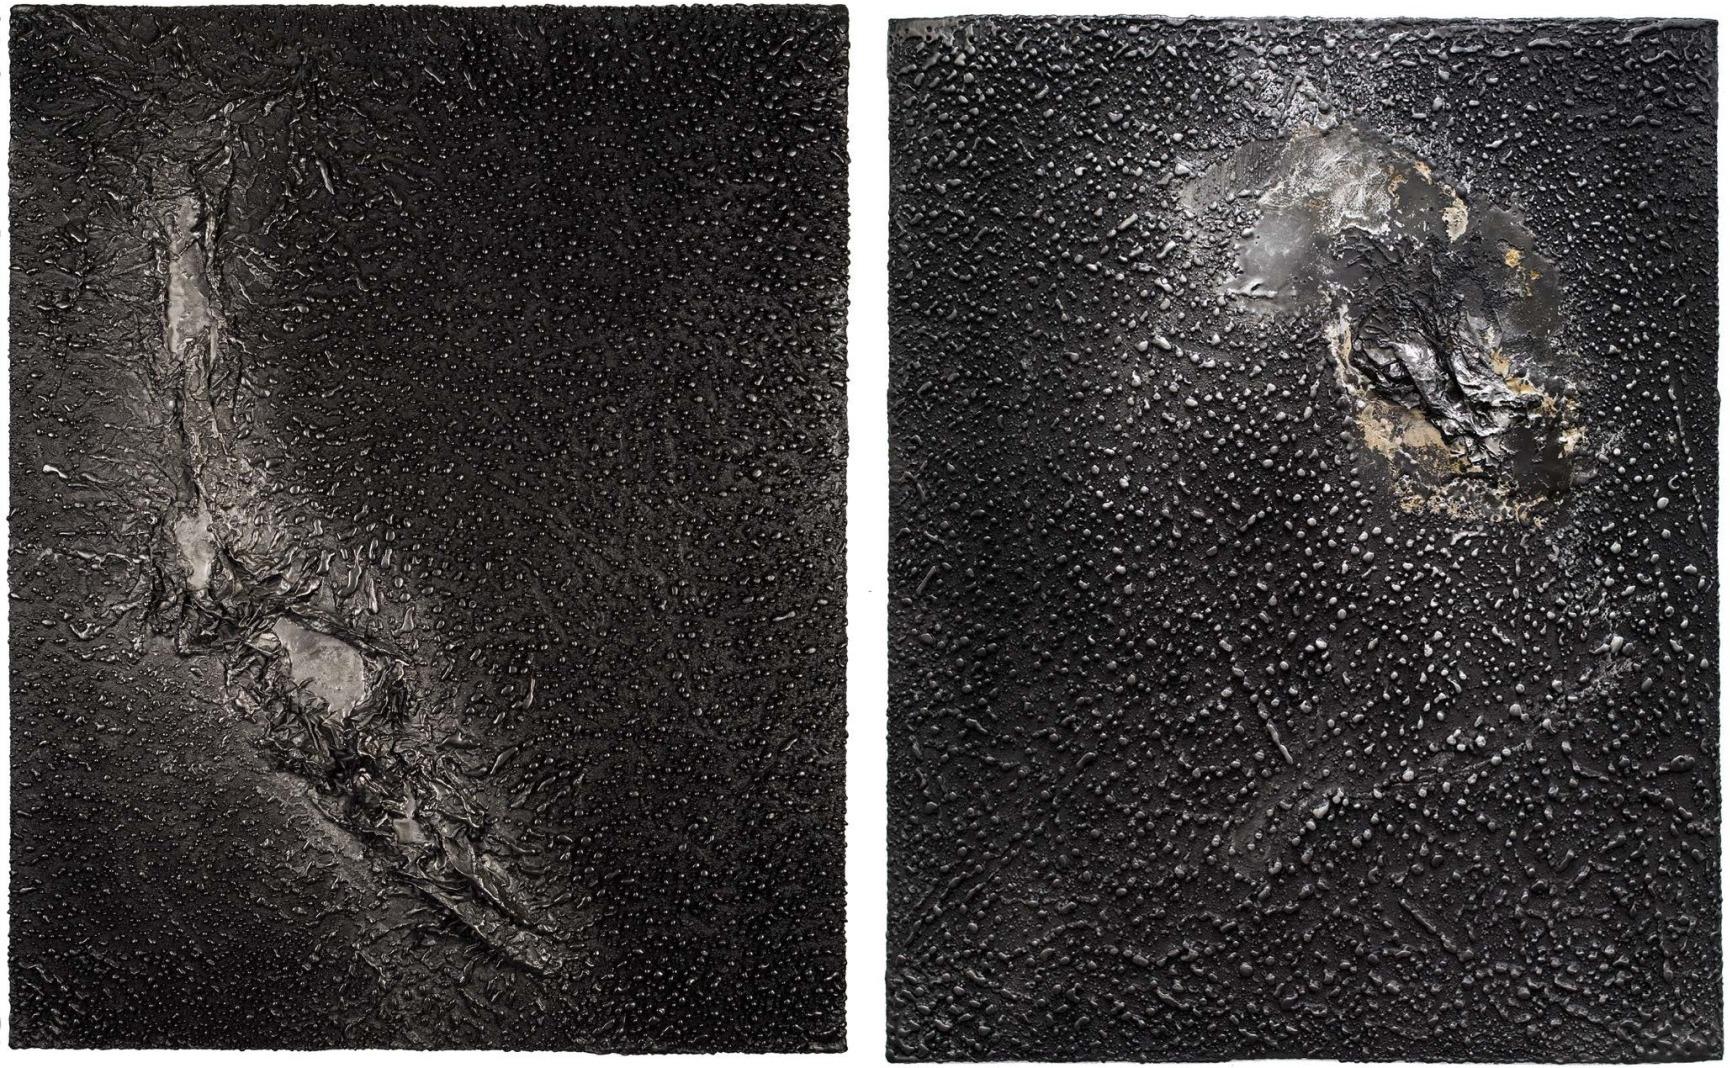 Gene Kiegel, Interdisciplinary Artist Recreating the Universe